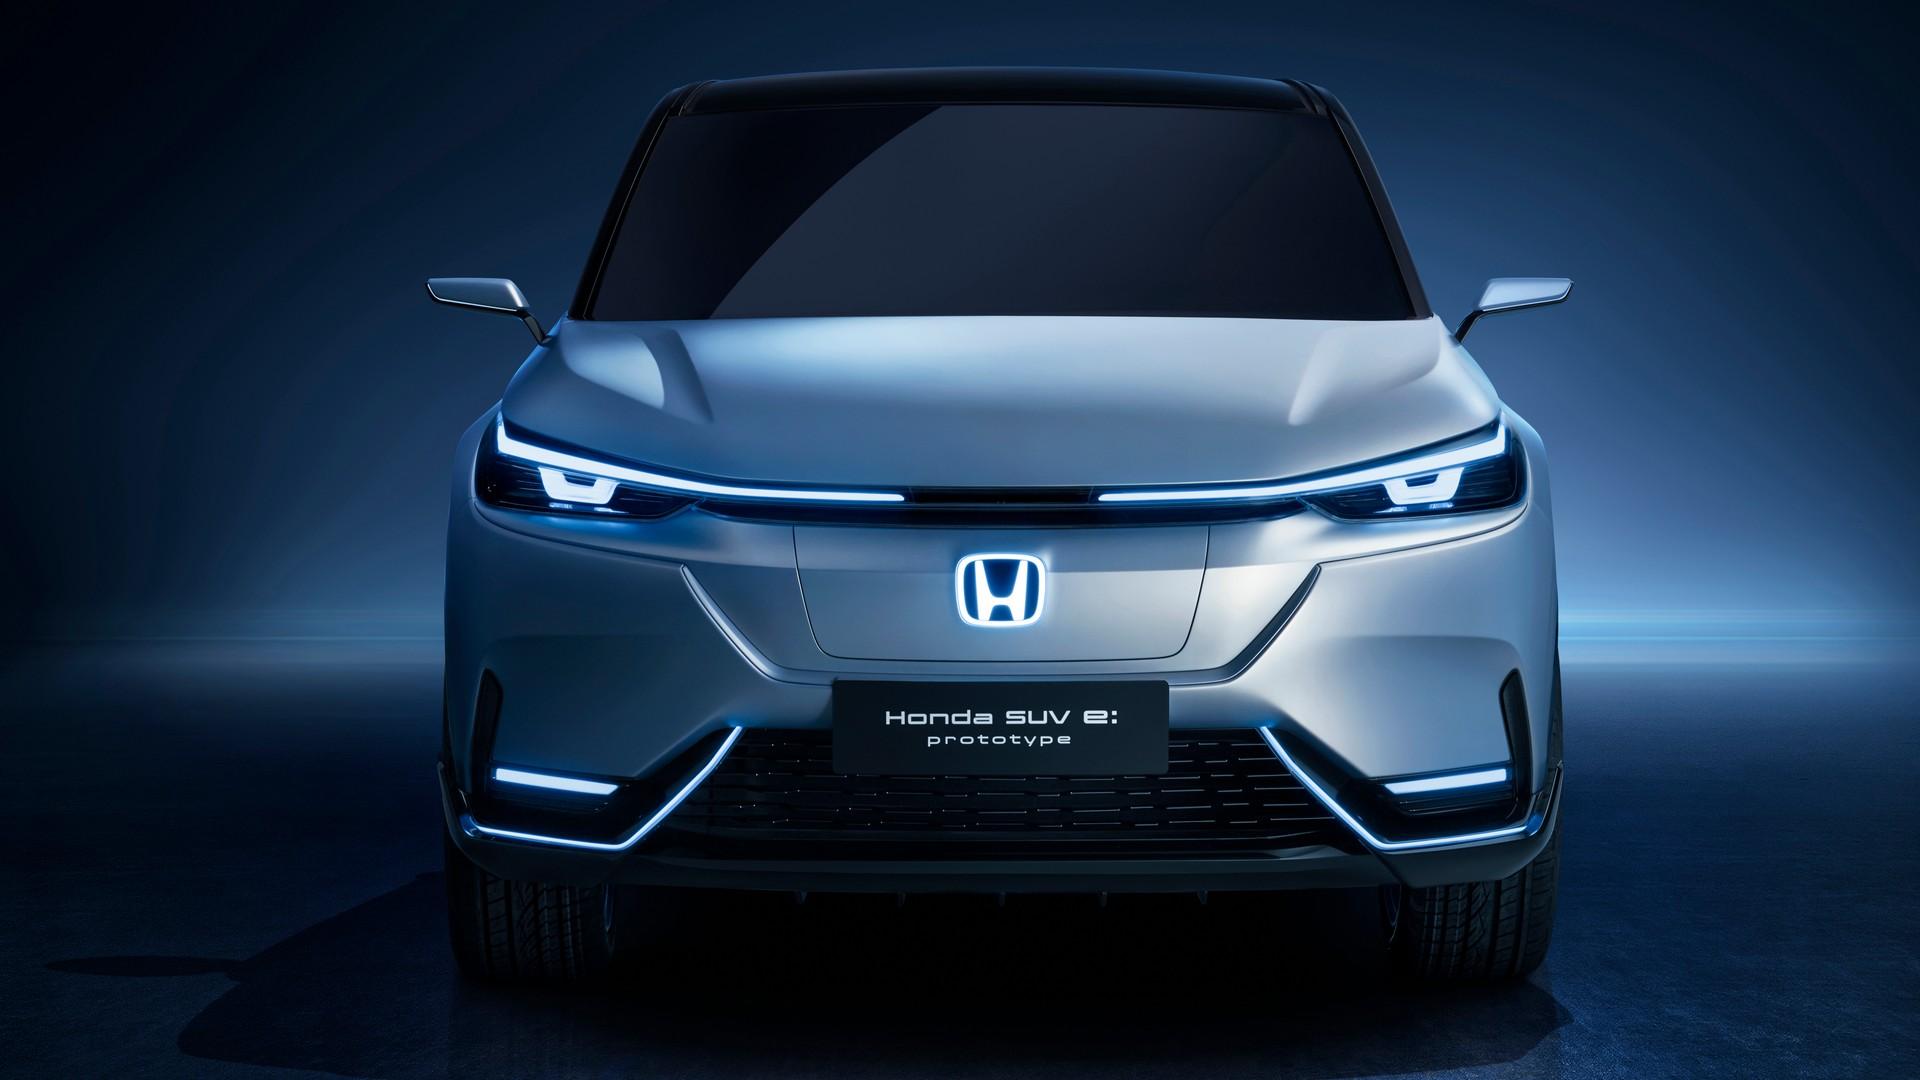 Honda E: prototype